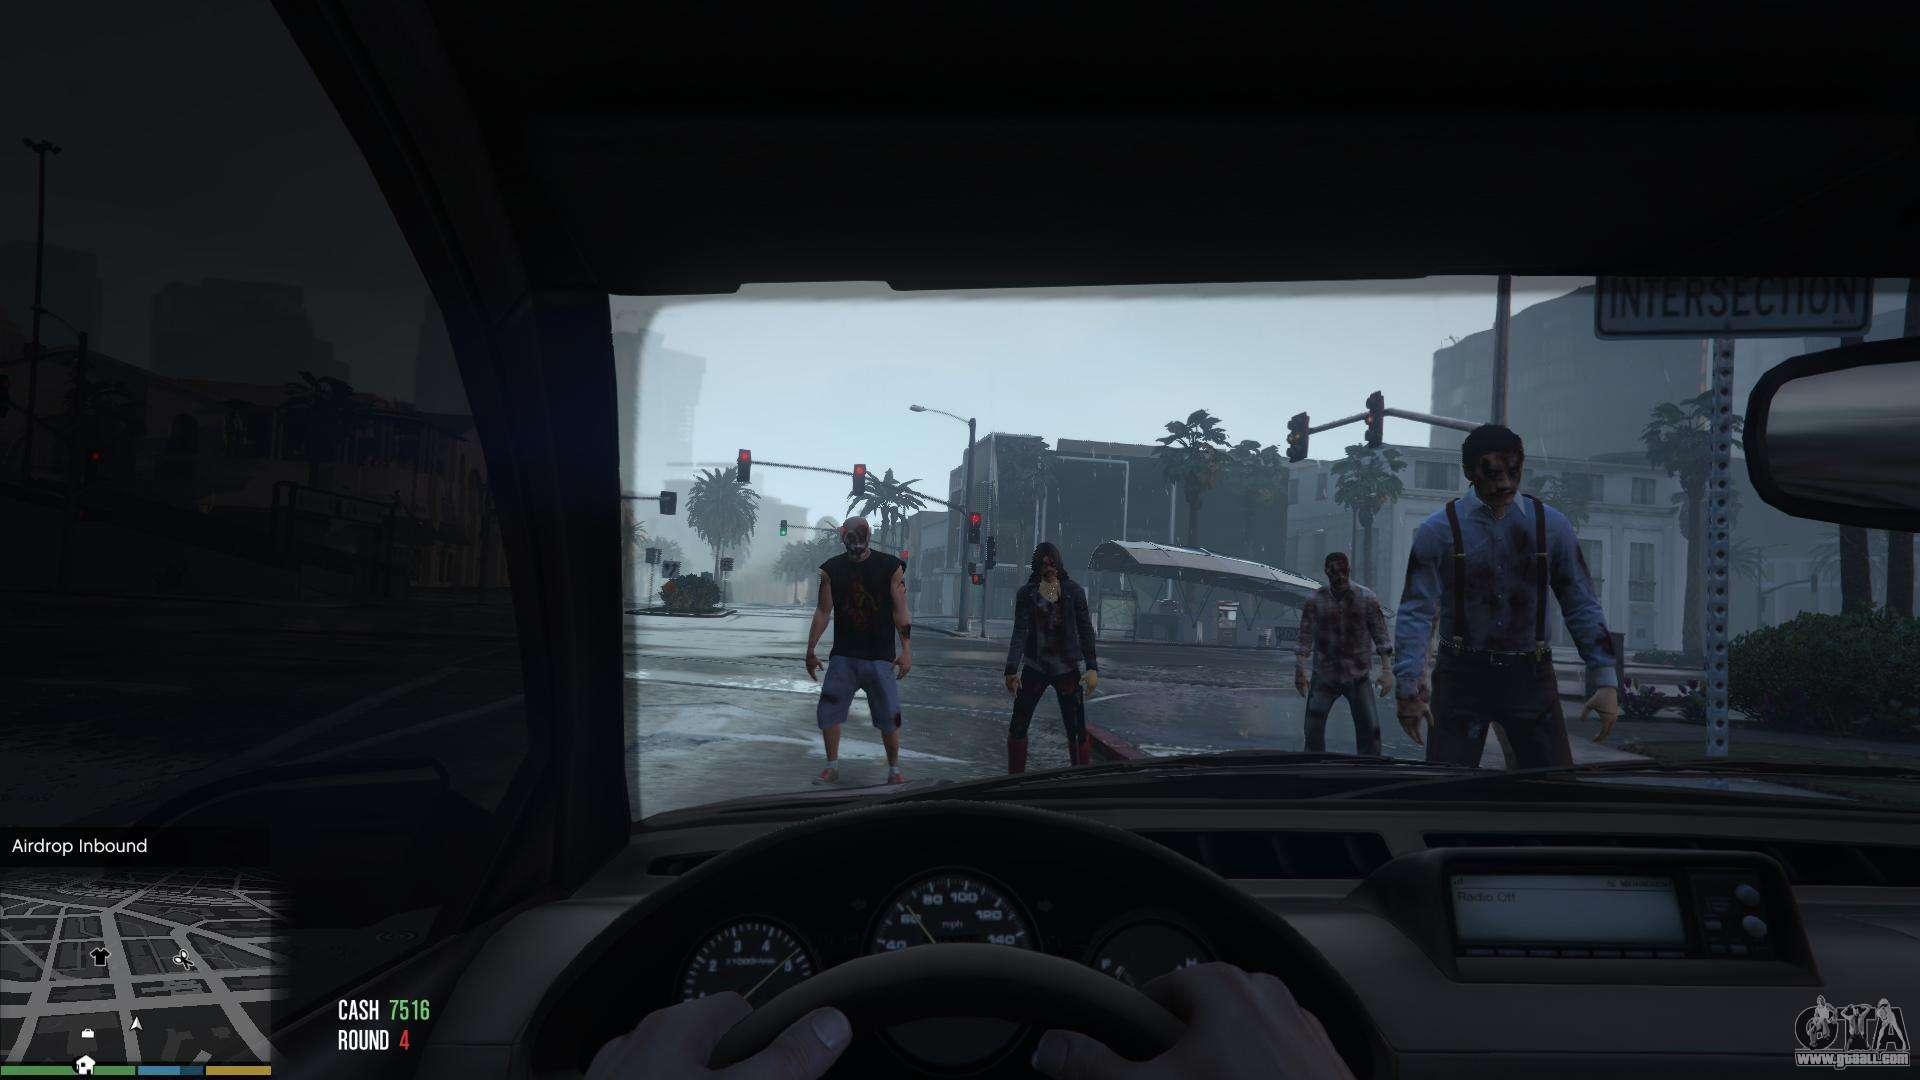 zombie download 5 mod how apocalypse gta to